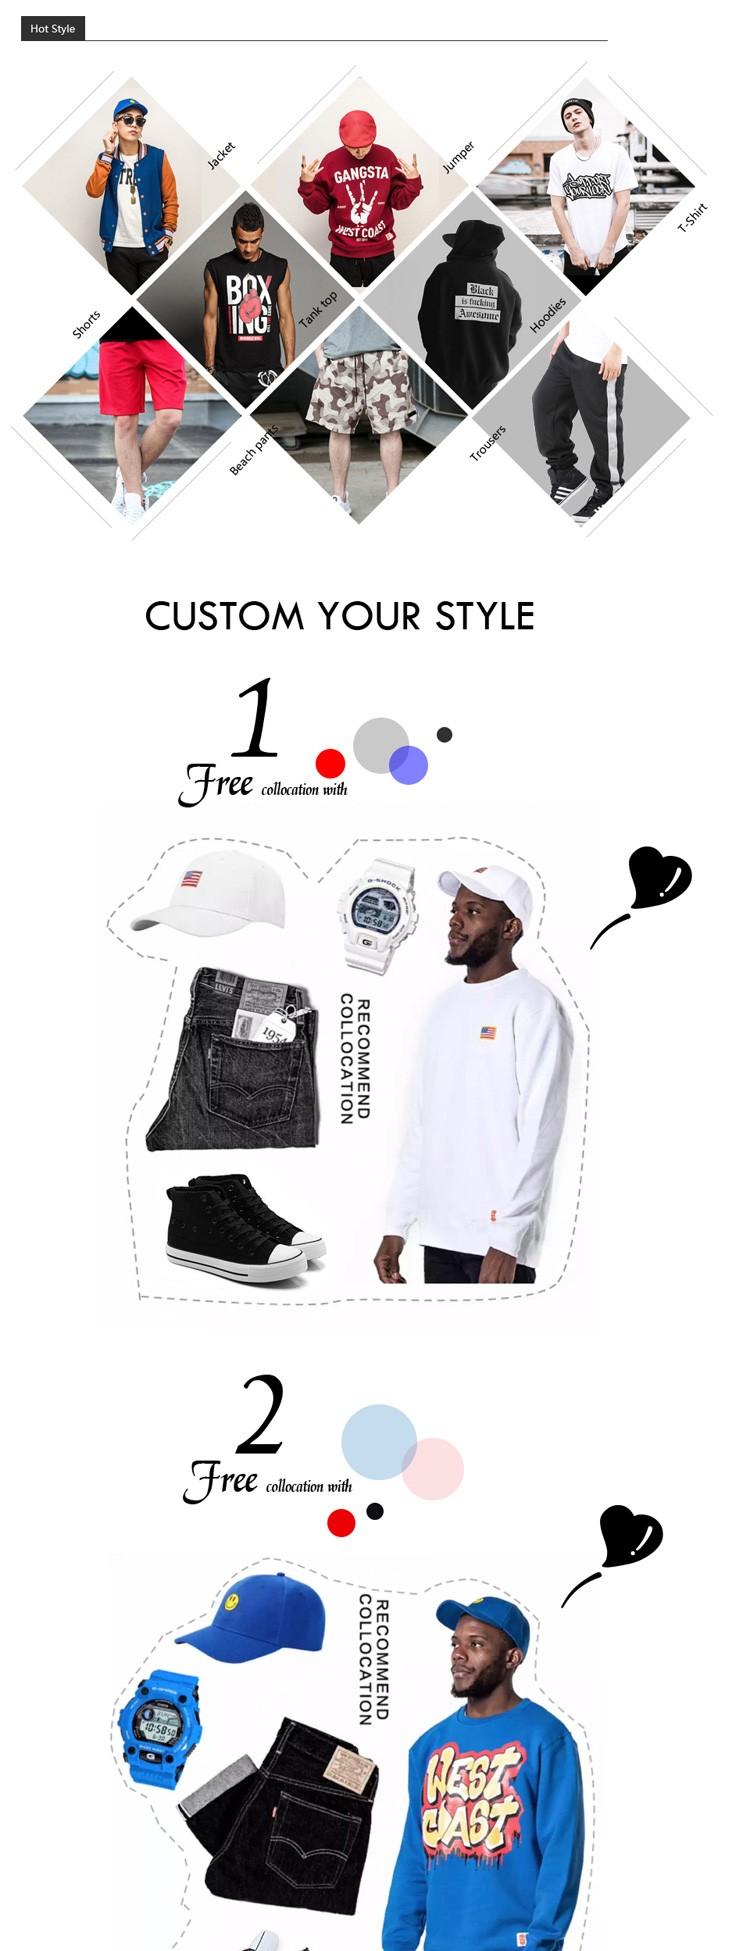 Design t shirt colar - Cheap Men S Plain New Design Polo T Shirt With Collar Solid Color